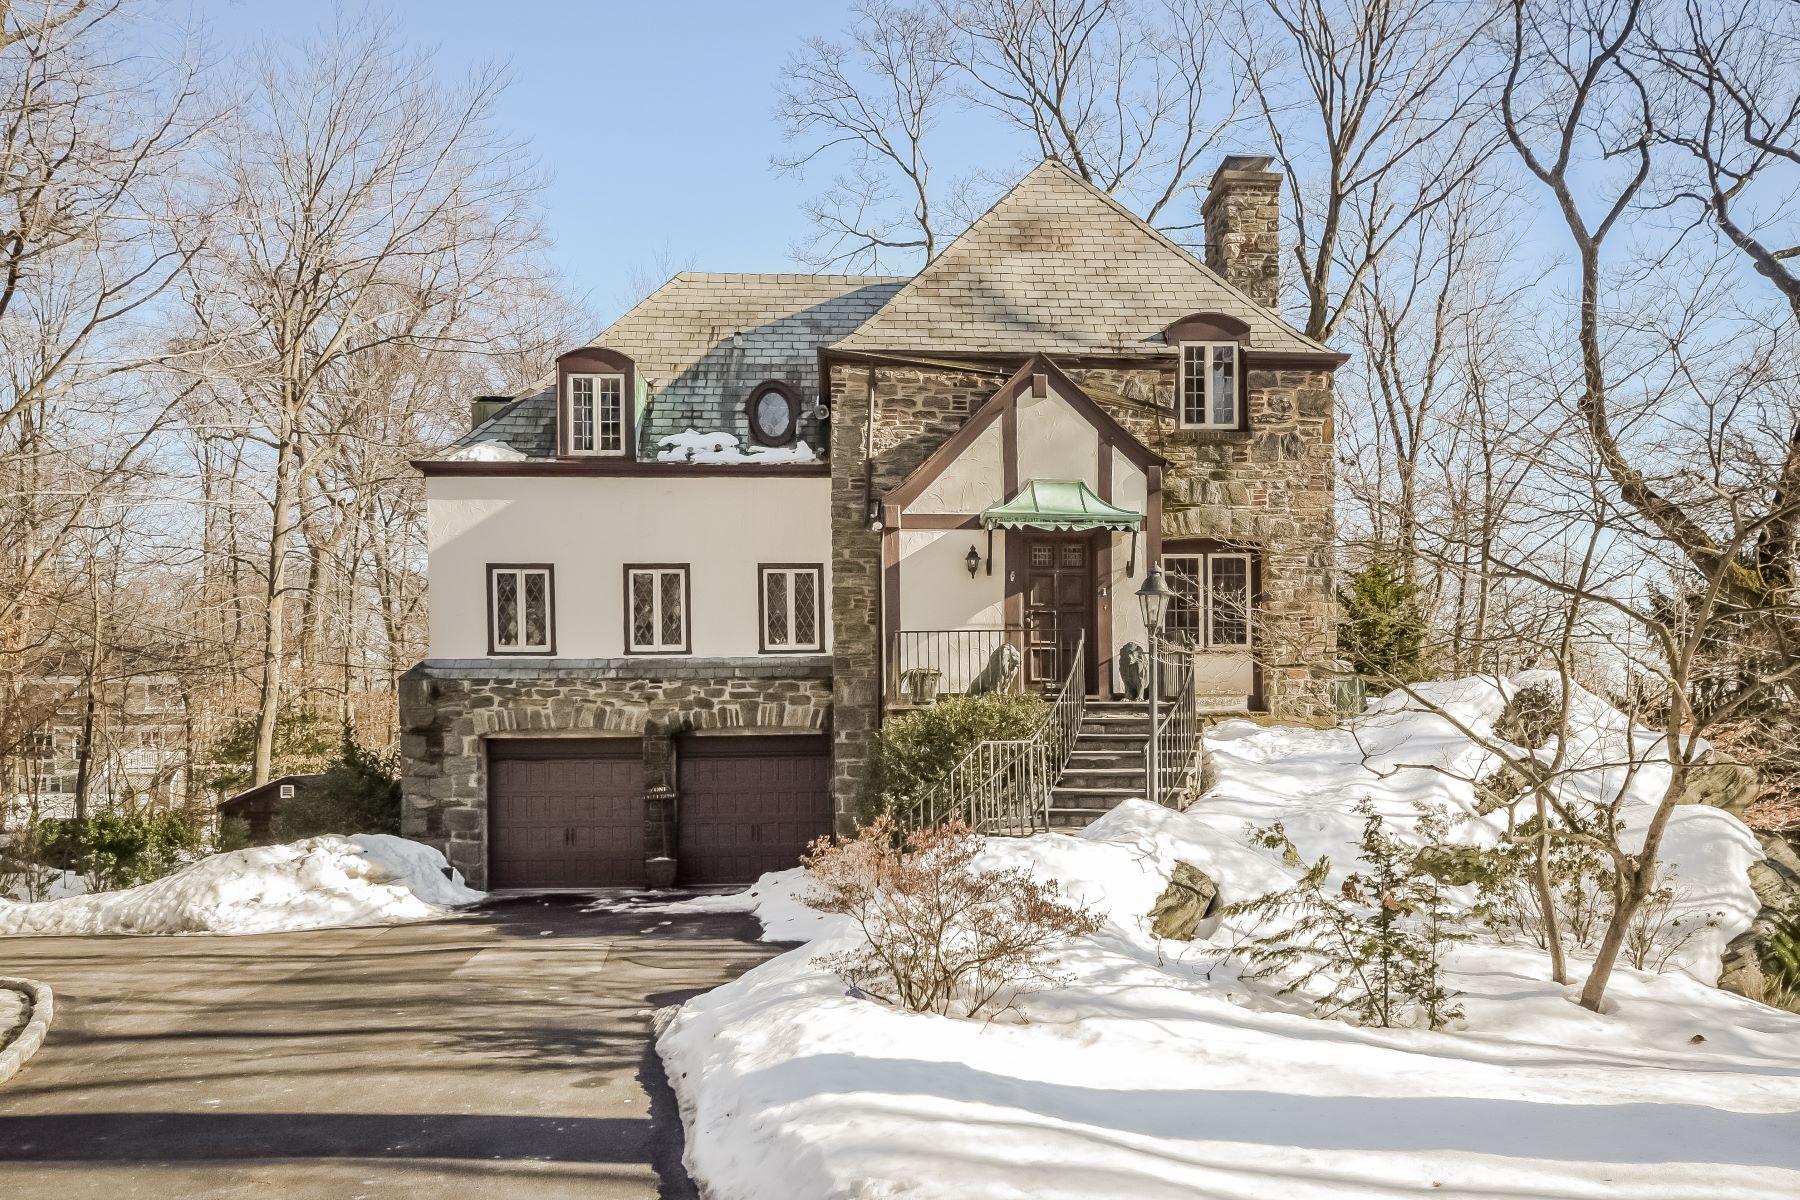 Single Family Home for Sale at Premier Tudor 1 Melrose Dr New Rochelle, New York 10804 United States